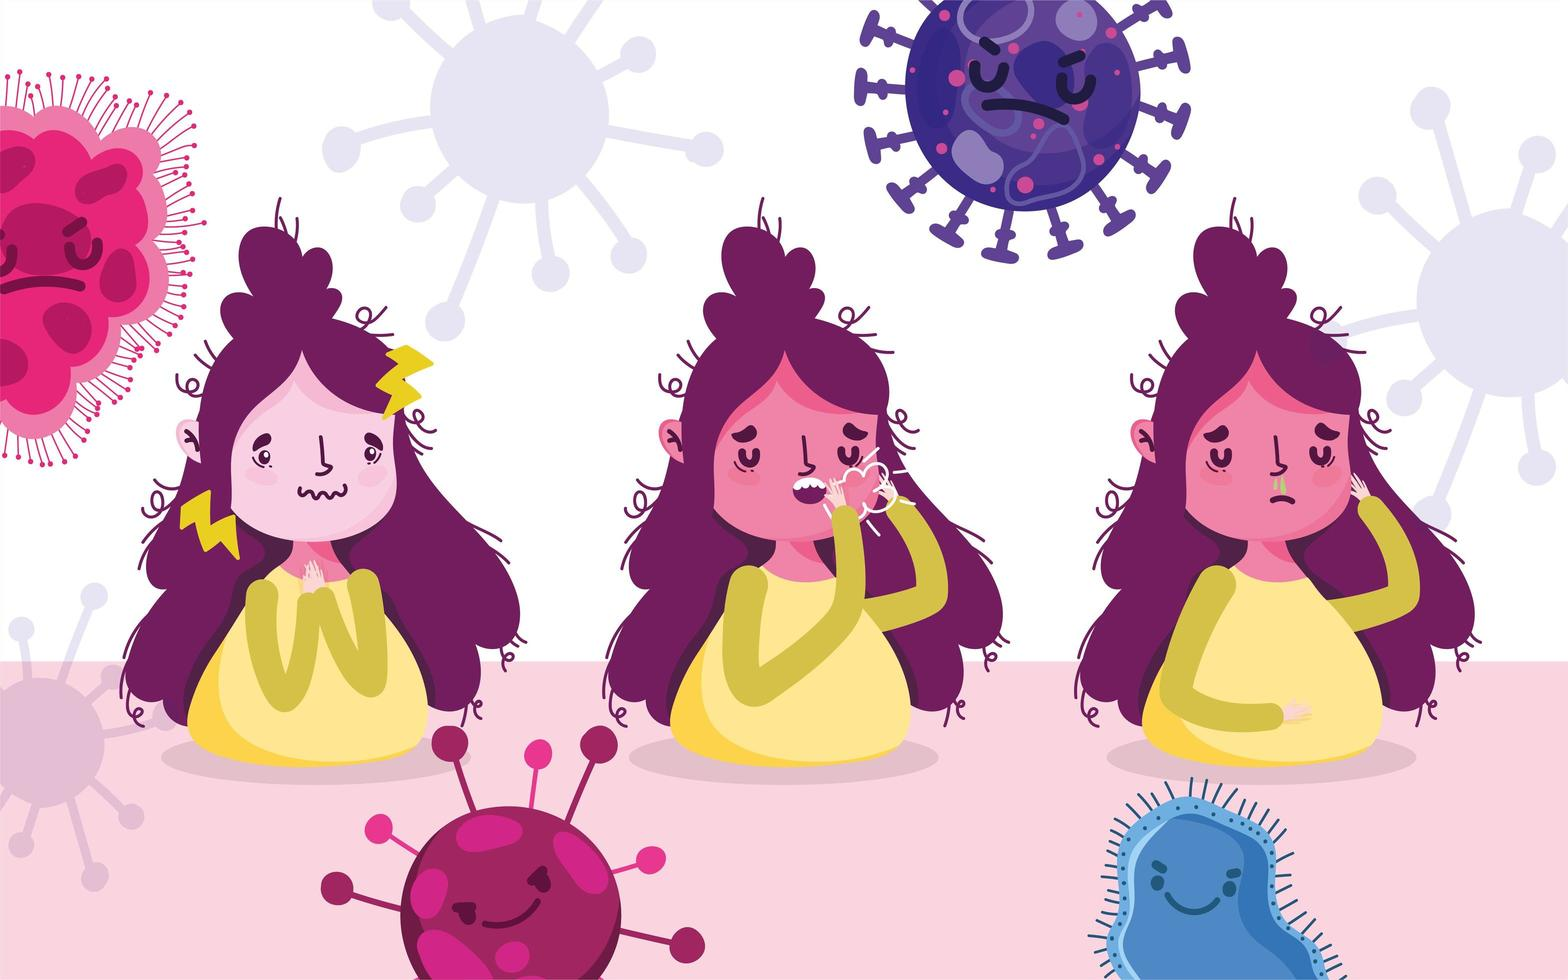 covid 19 pandemisk design med kvinnor med symtom vektor